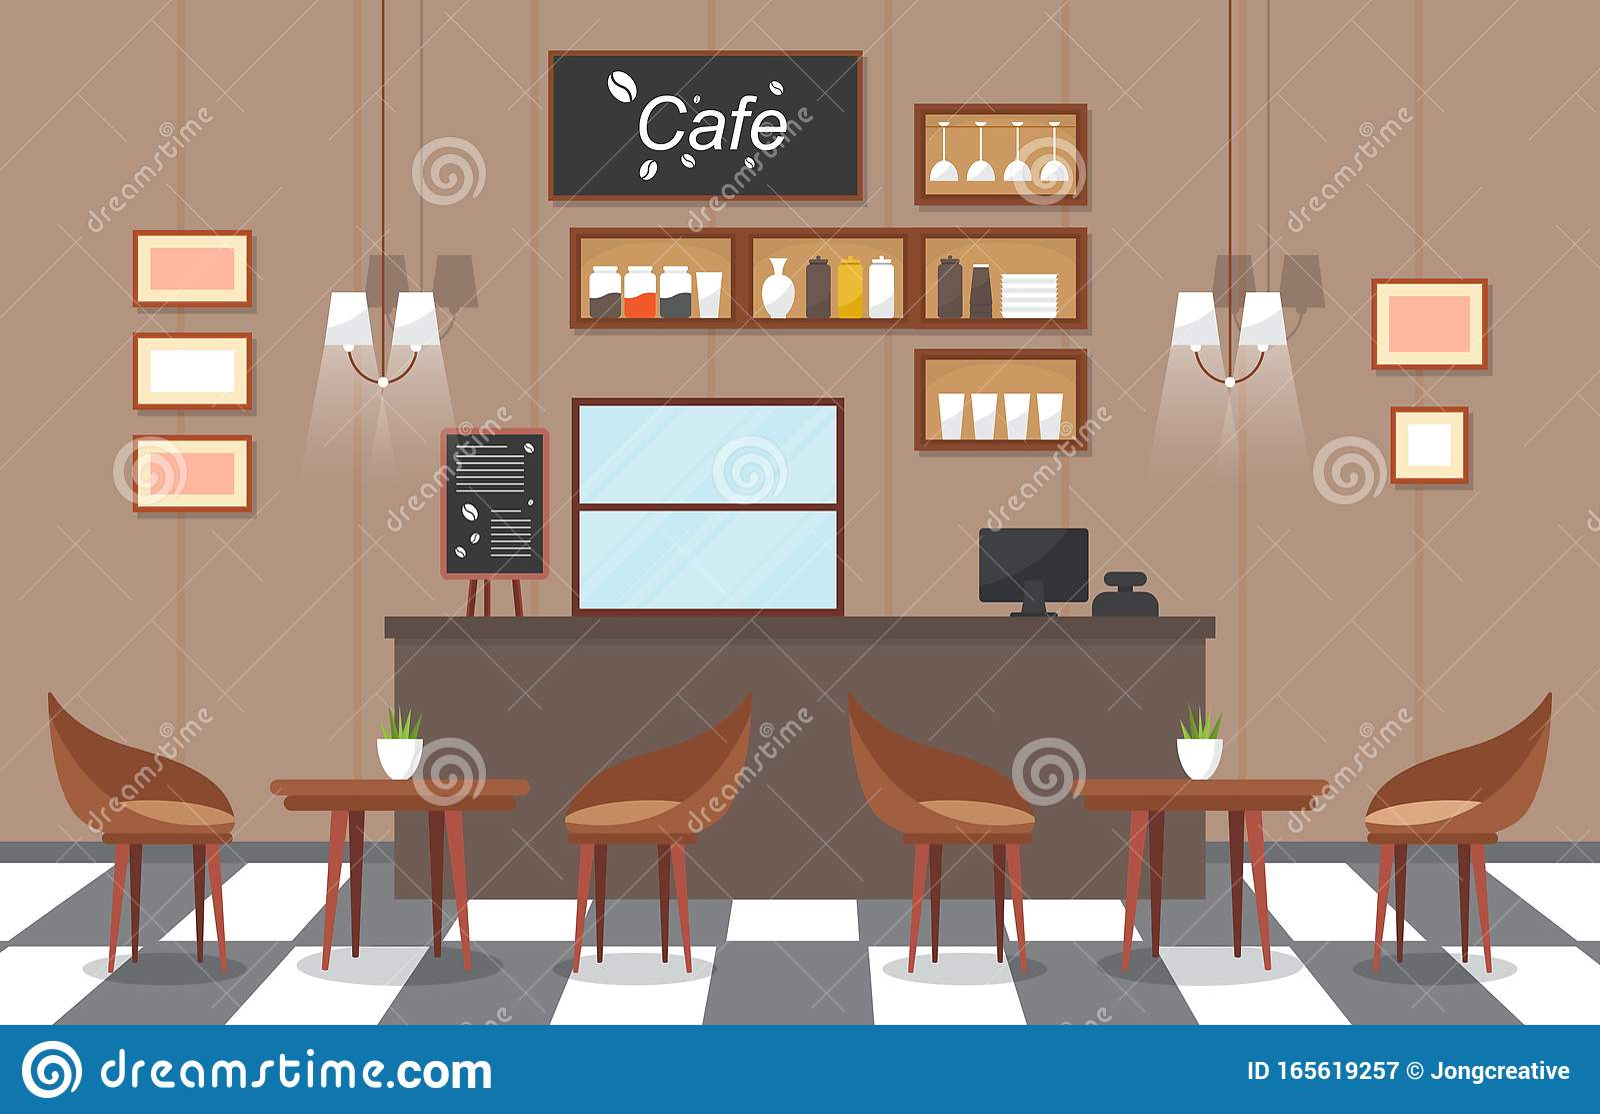 Modern Cafe Coffee Shop Interior Furniture Restaurant Flat Design Illustration Stock Vector Illustration Of Coffee House 165619257